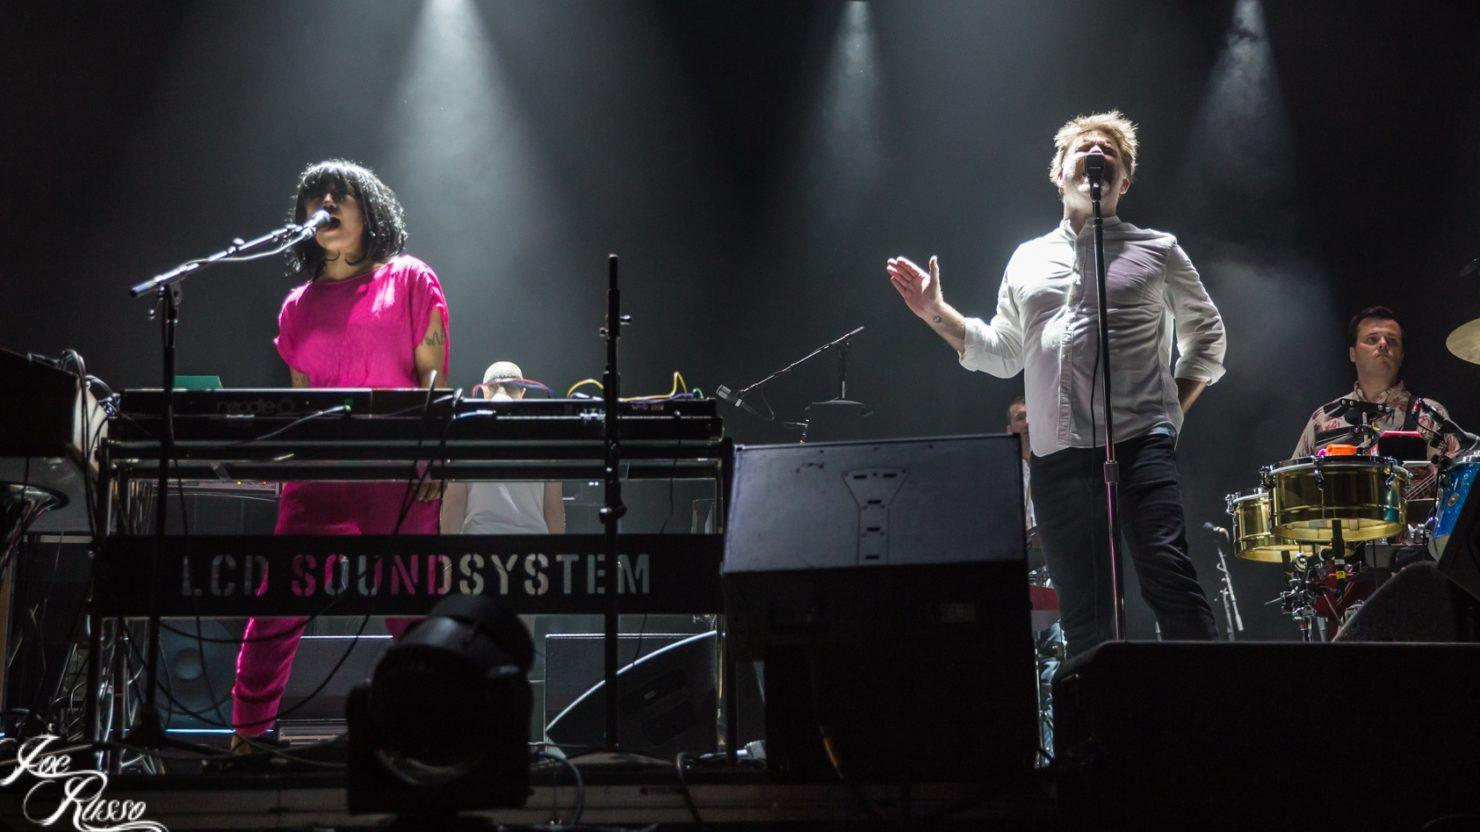 Lcd soundsystem tour dates in Australia